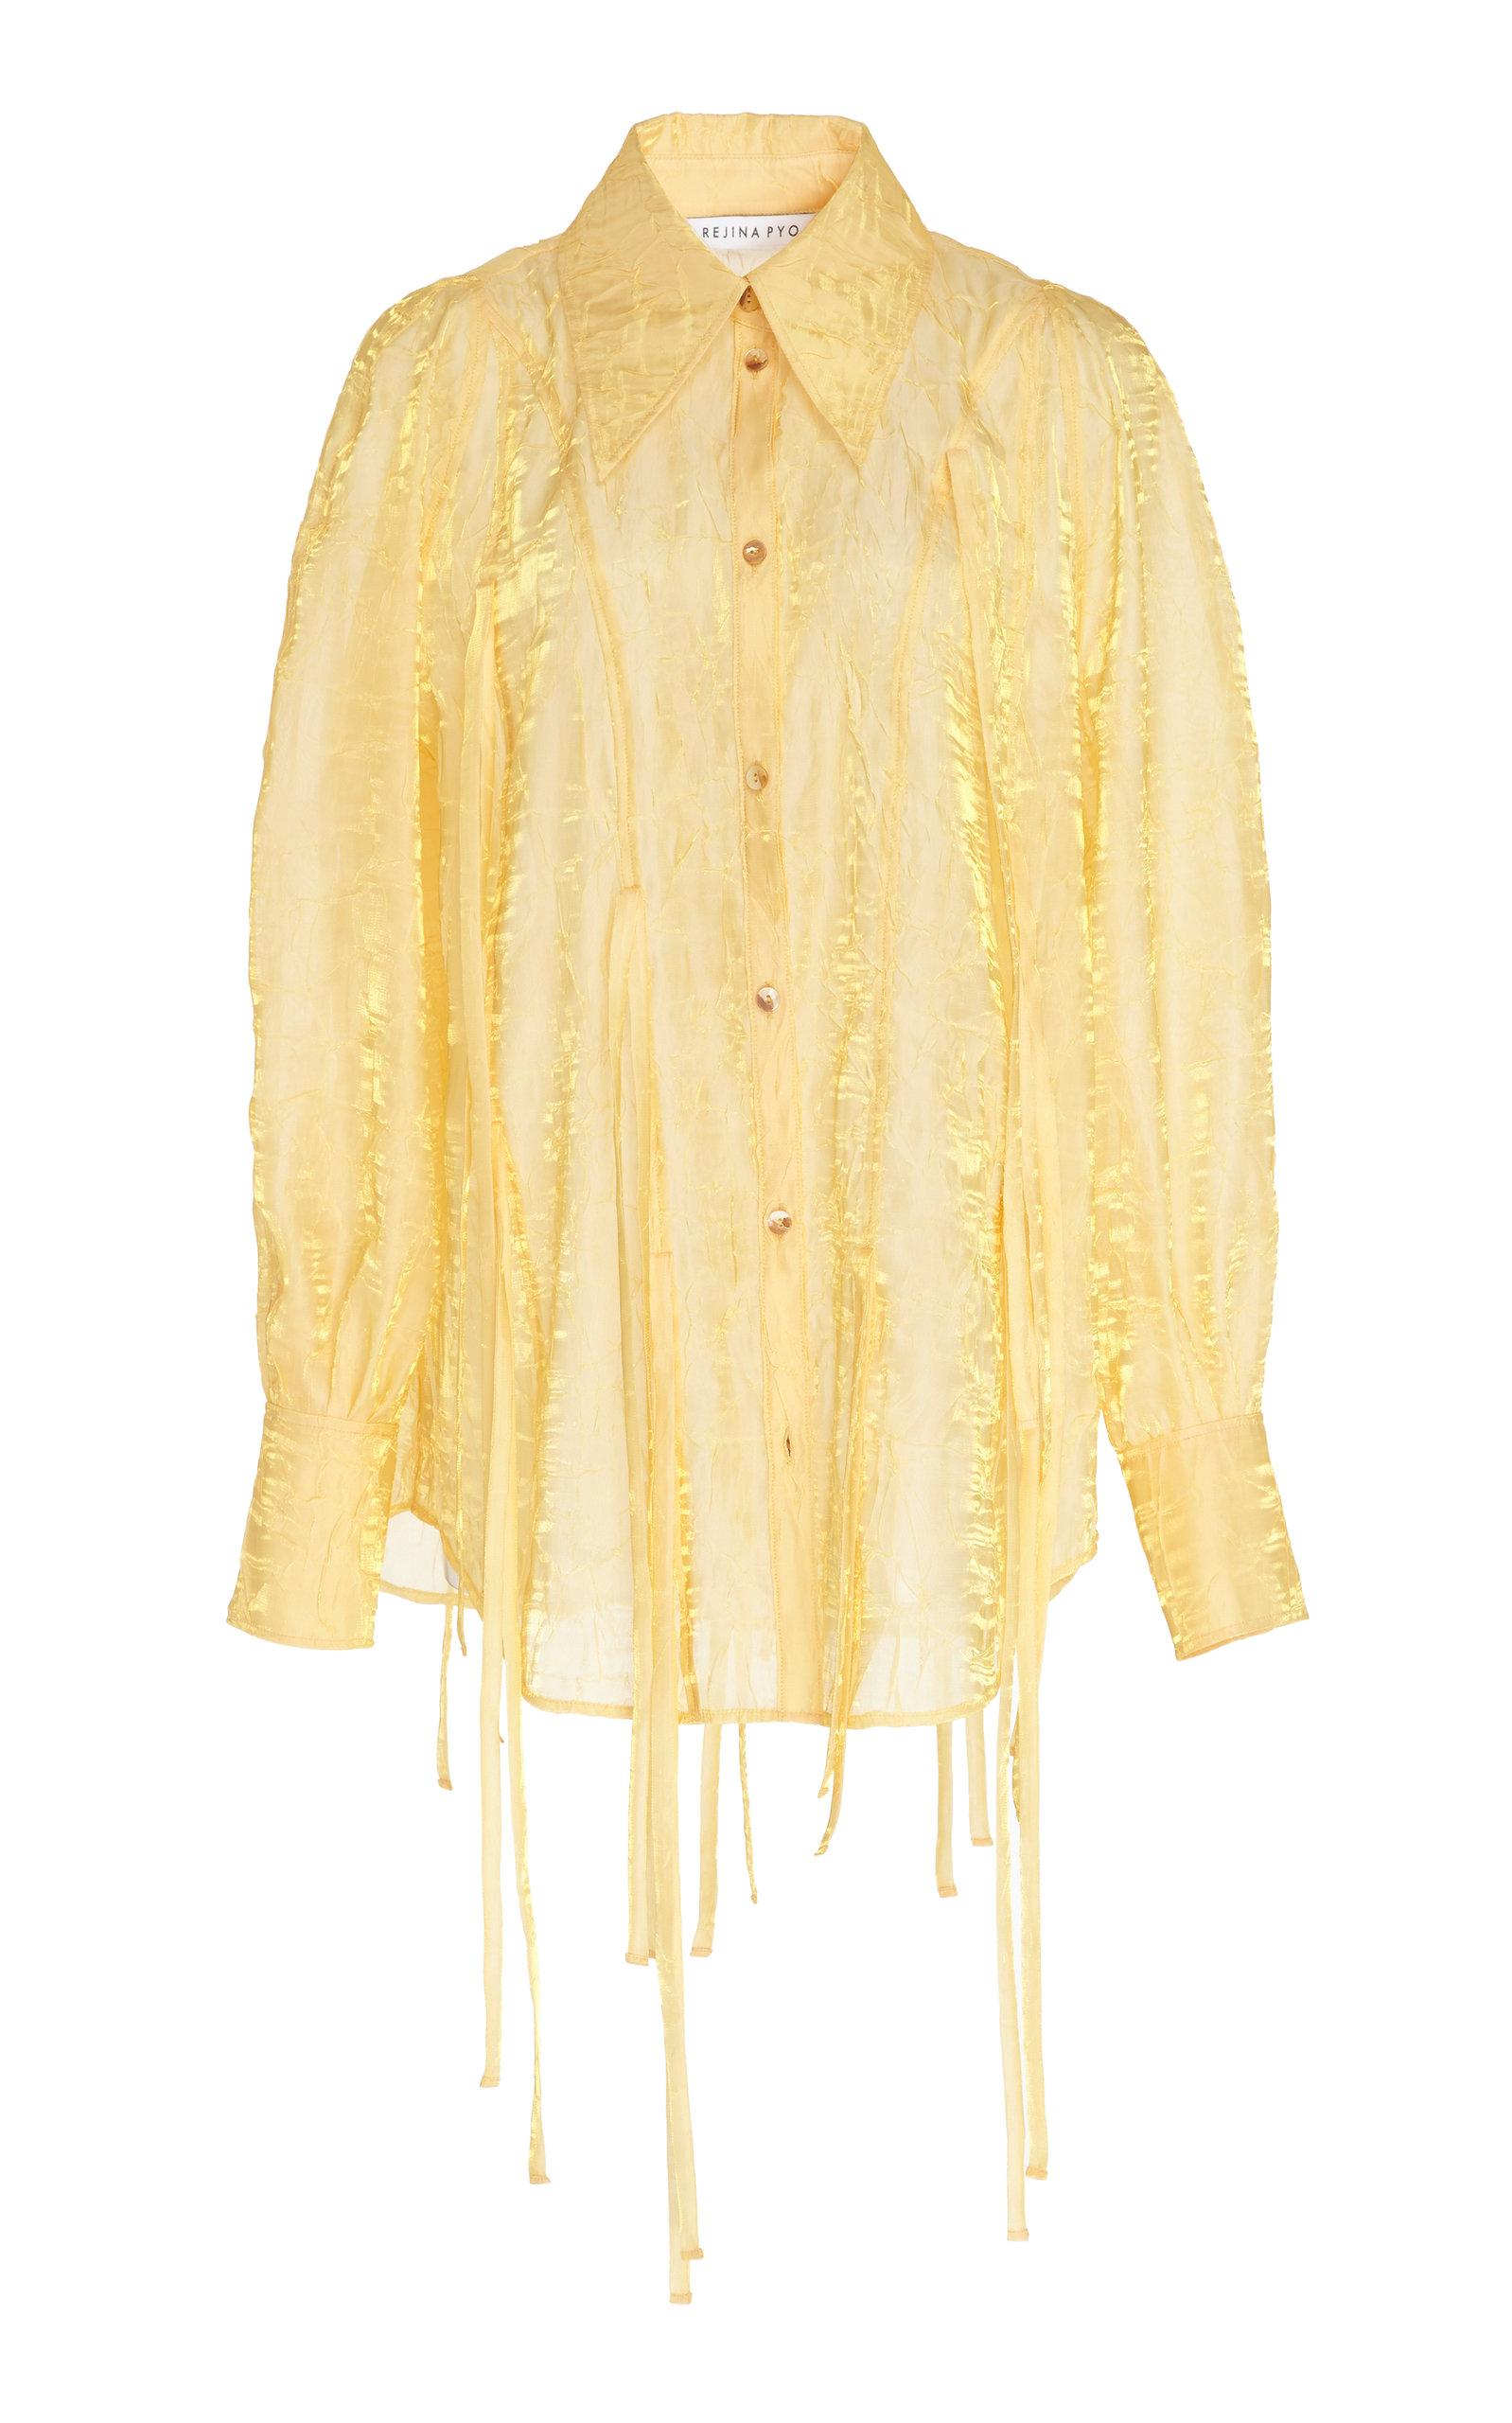 Rejina Pyo T-shirts LANA COLLARED TIE-DETAILED COTTON SHIRT